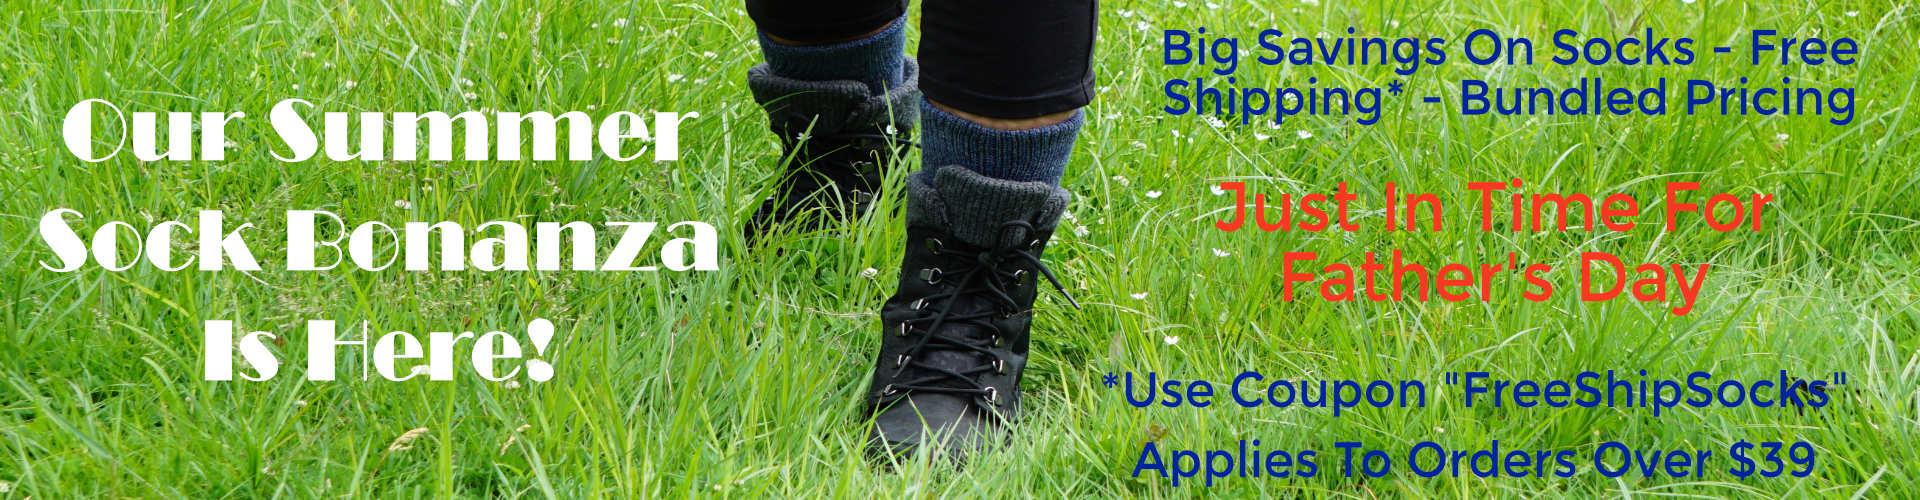 Summer Alpaca Sock Bonanza. Huge Savings On Alpaca Socks.